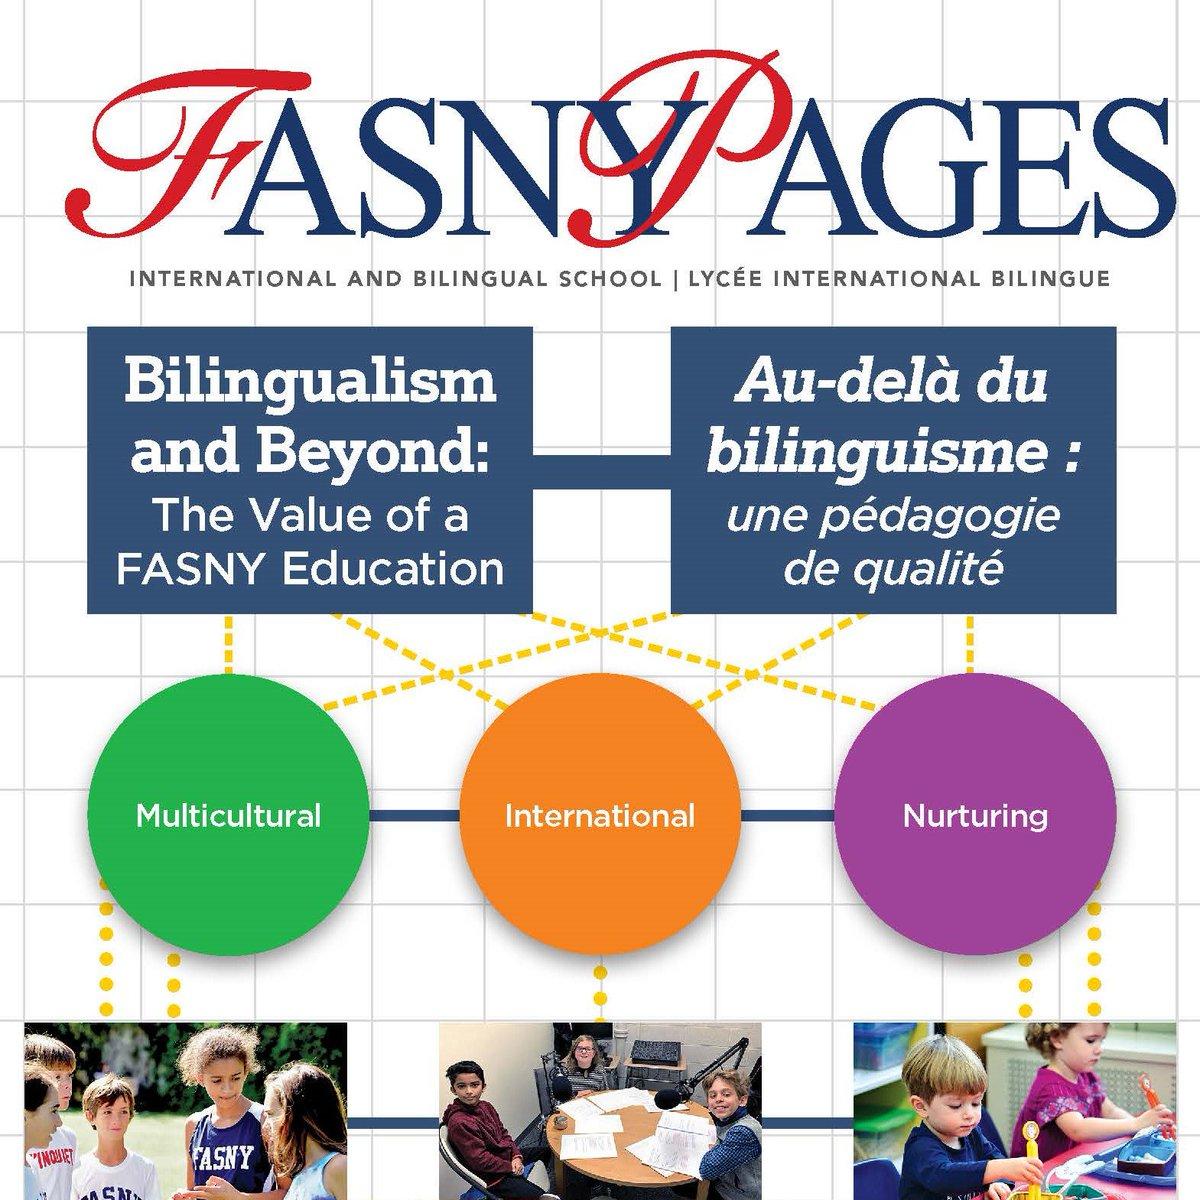 French-American School of New York (@fasnynews) | Twitter